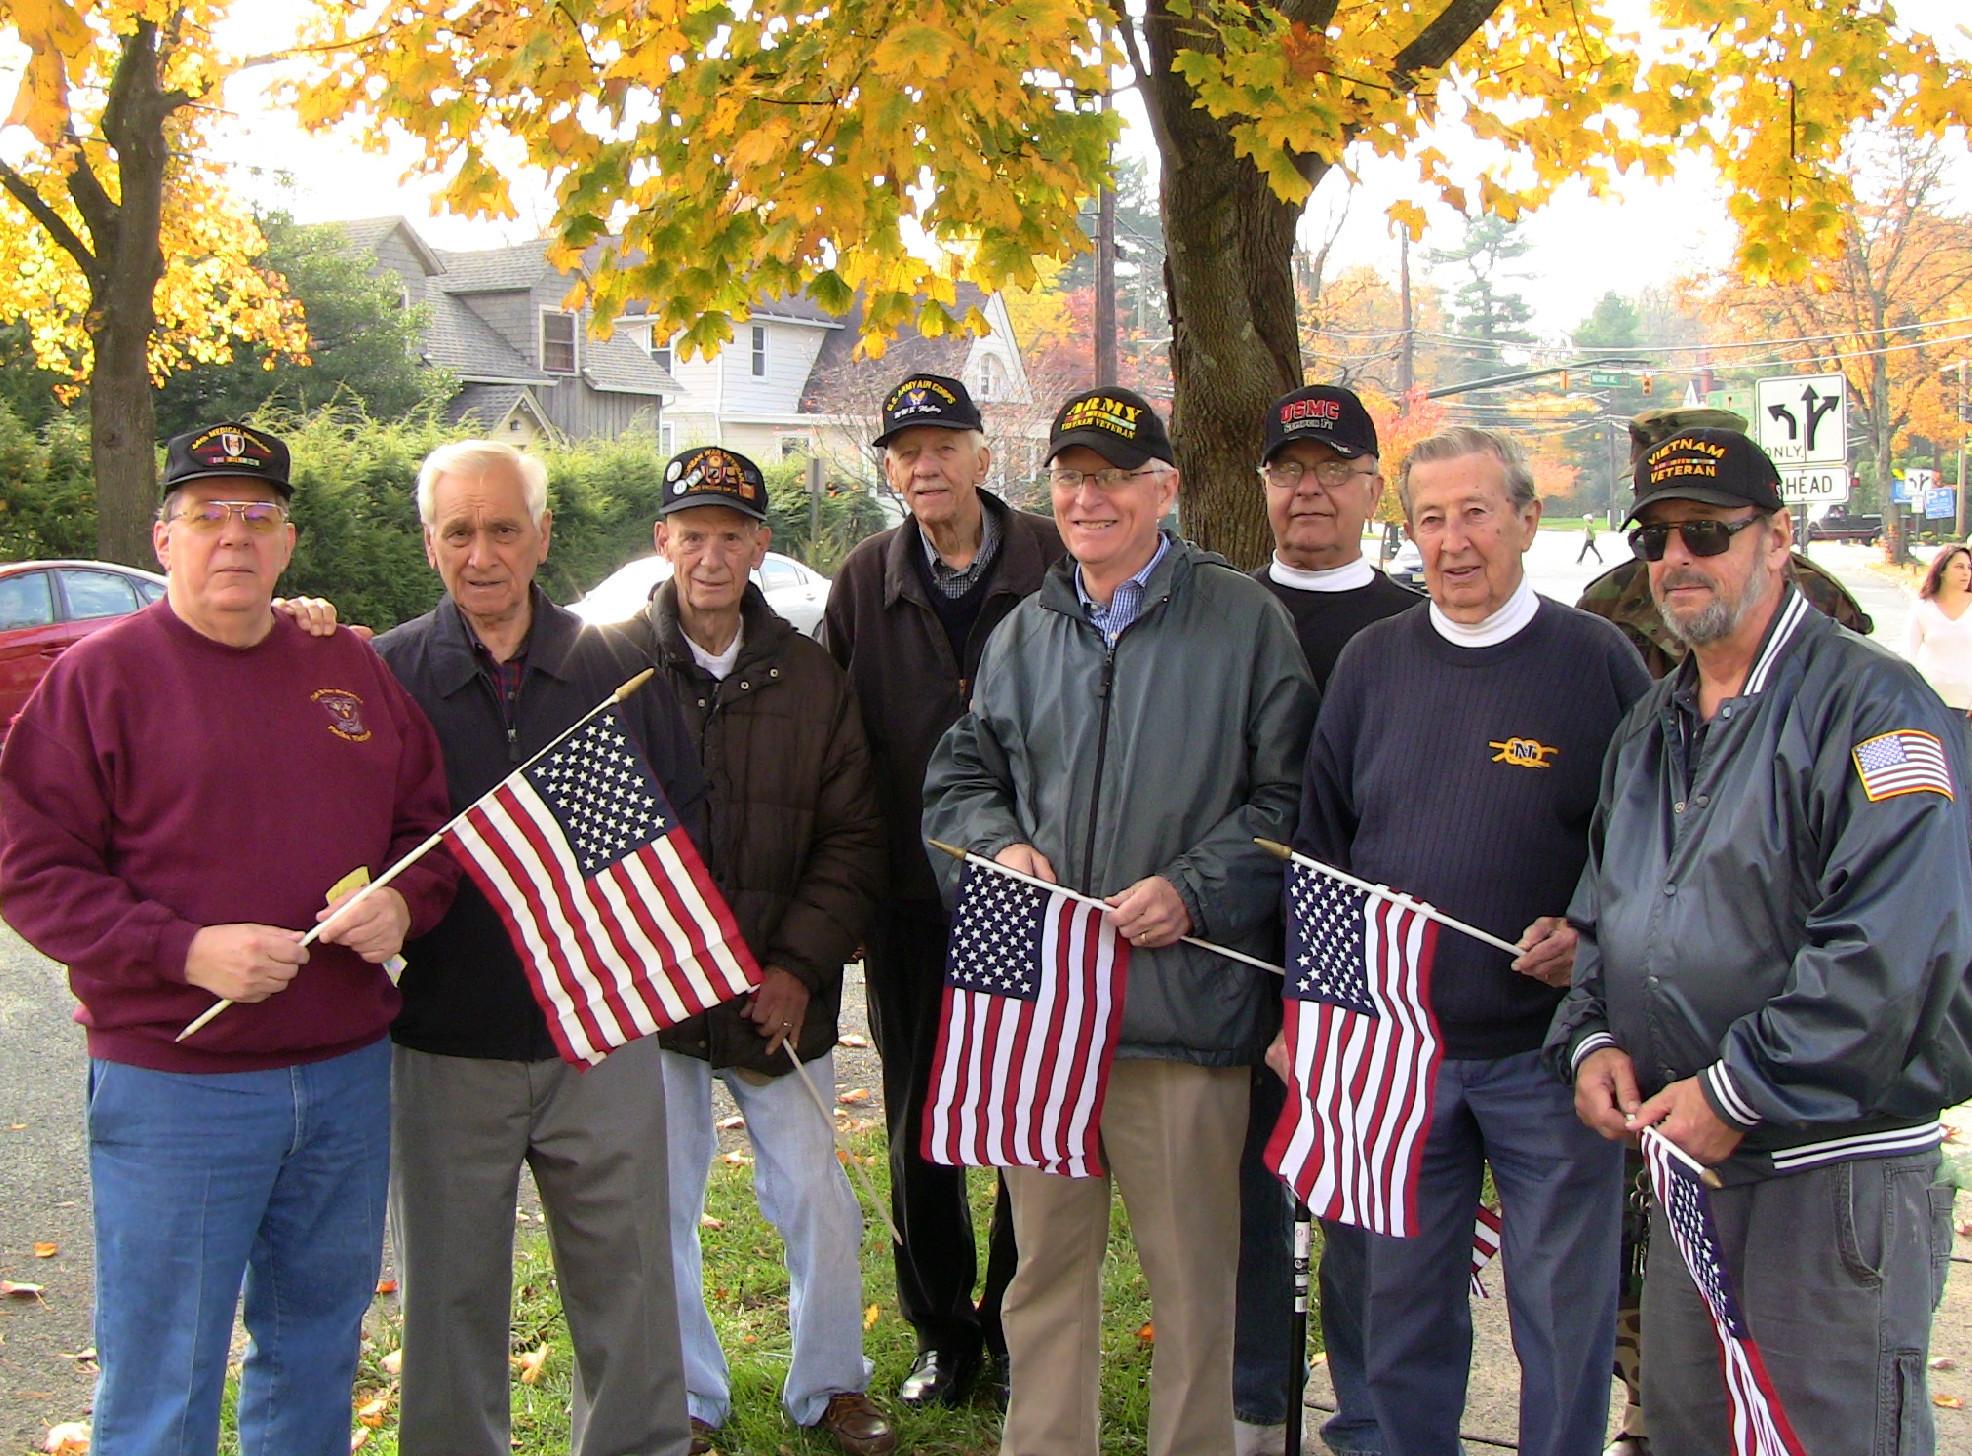 9dee73b95208317a3d92_Veterans_gather_at_Fanwood_ceremony.JPG